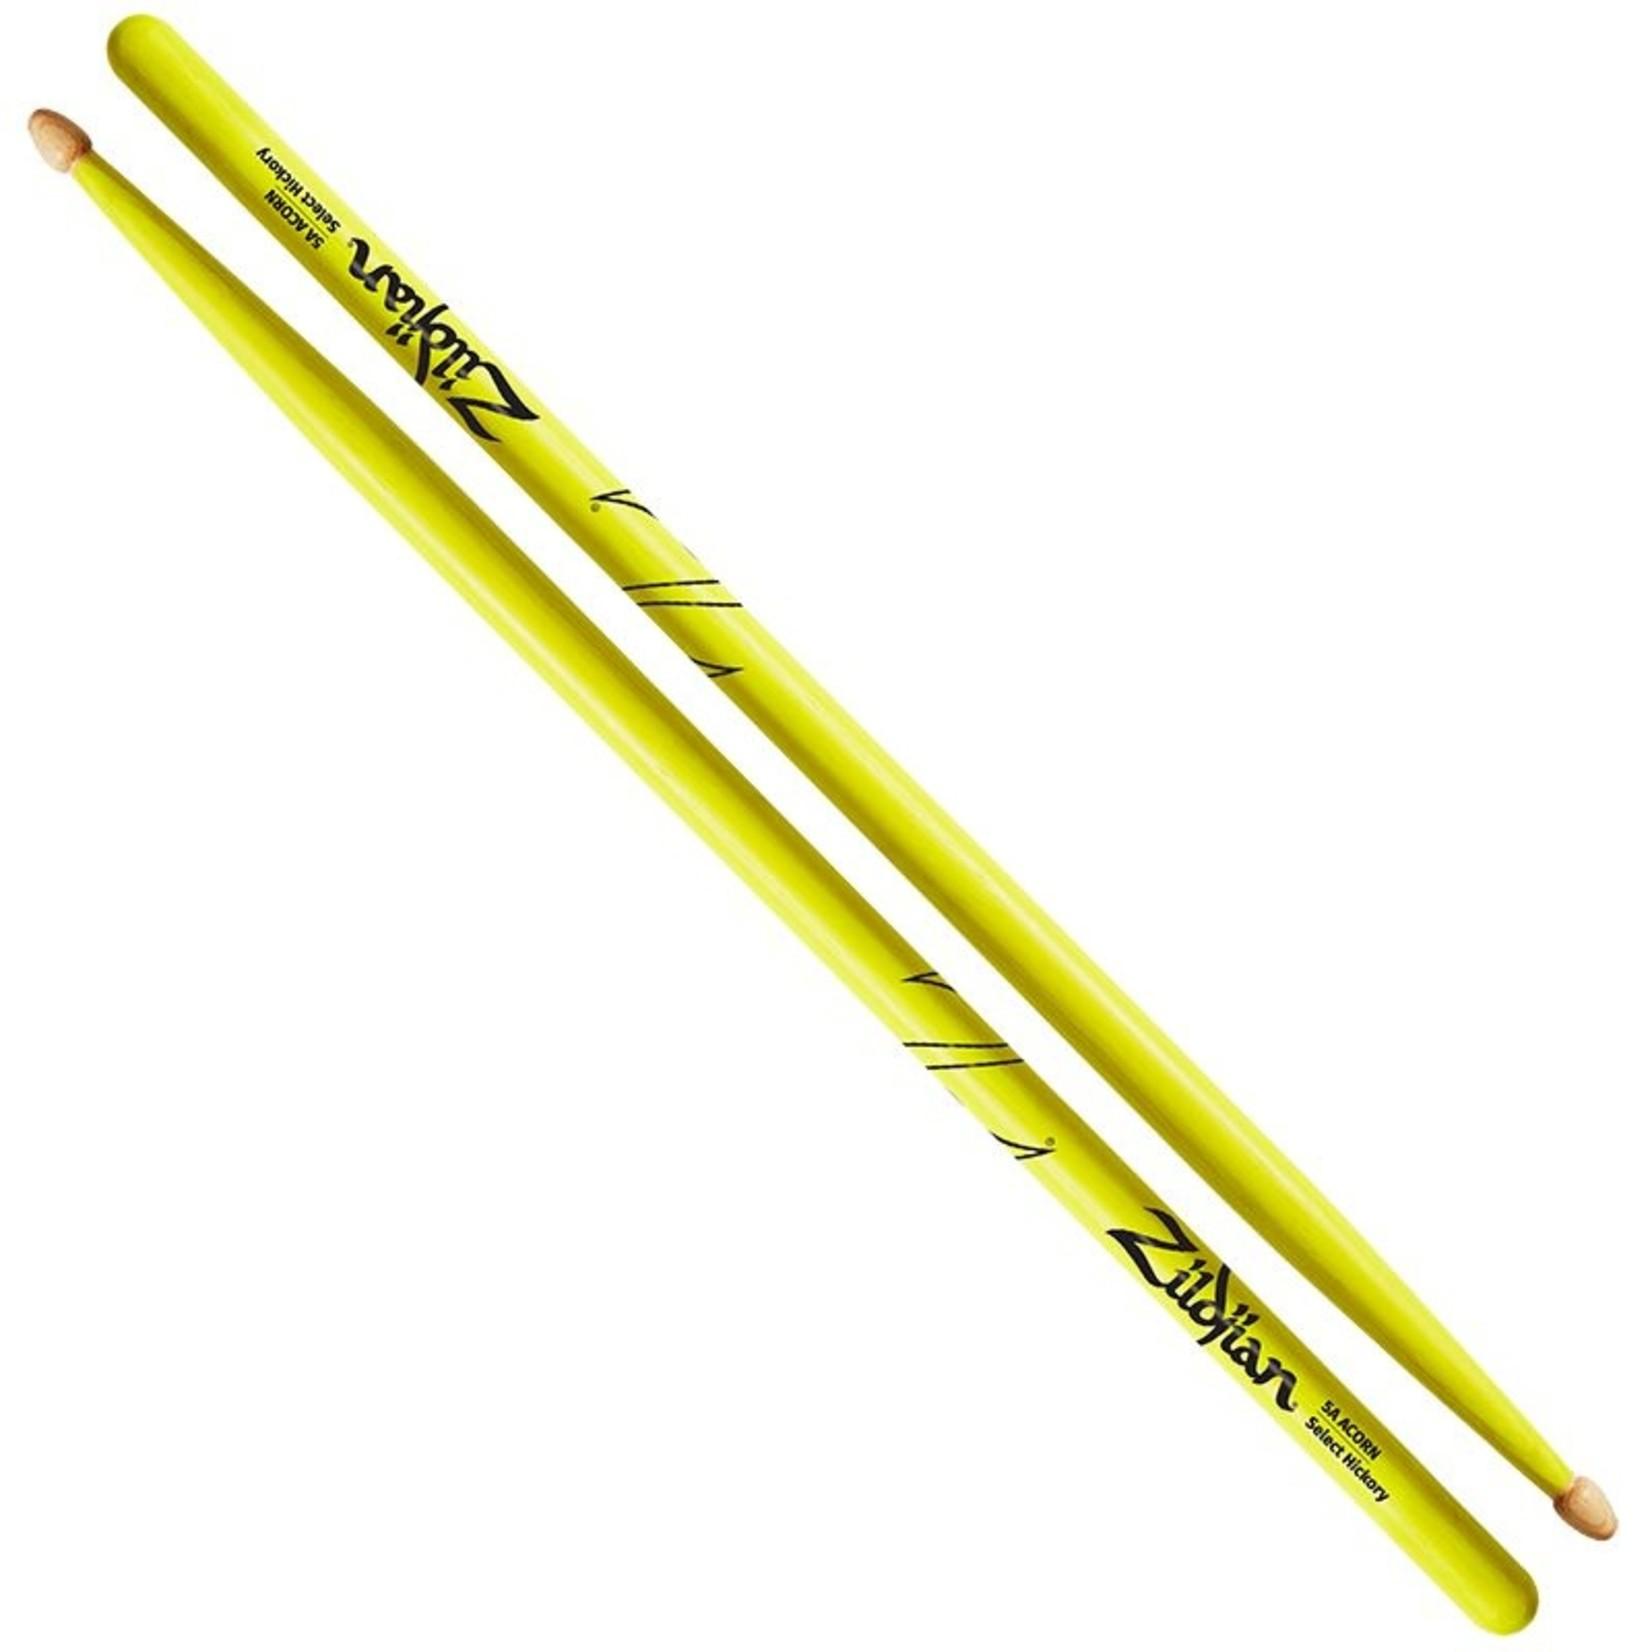 Zildjian Zildjian 5A Acorn Neon Yellow Drumsticks